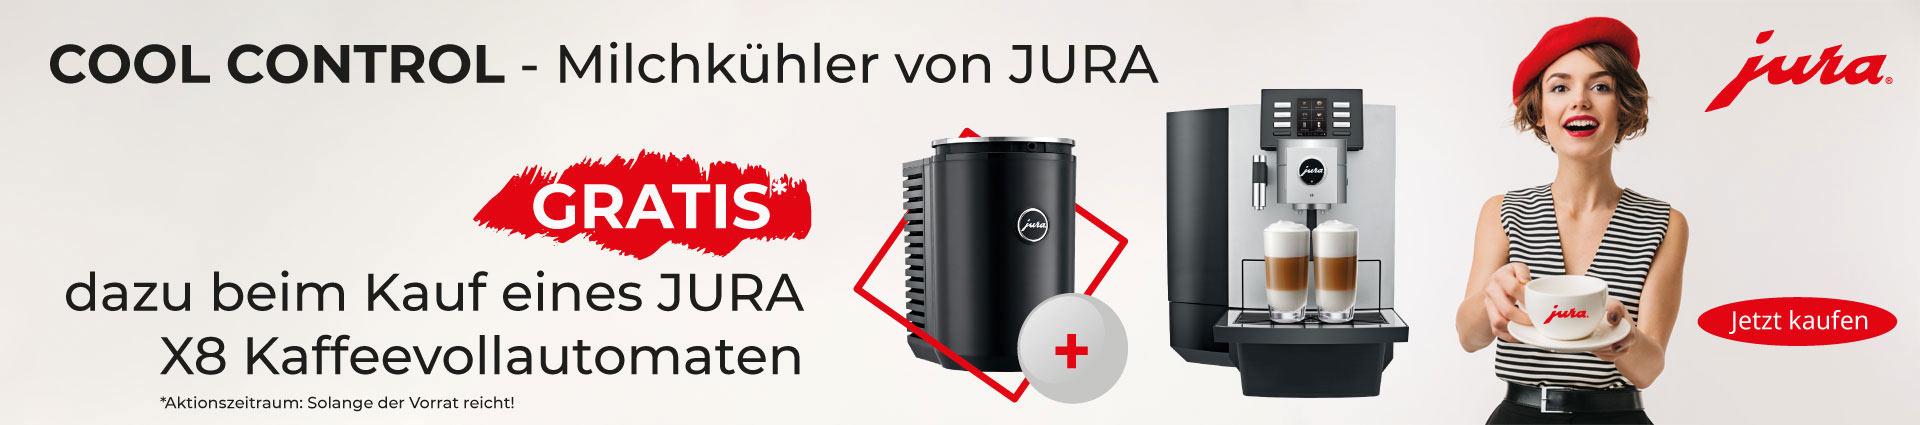 JURA Cool Control Banner